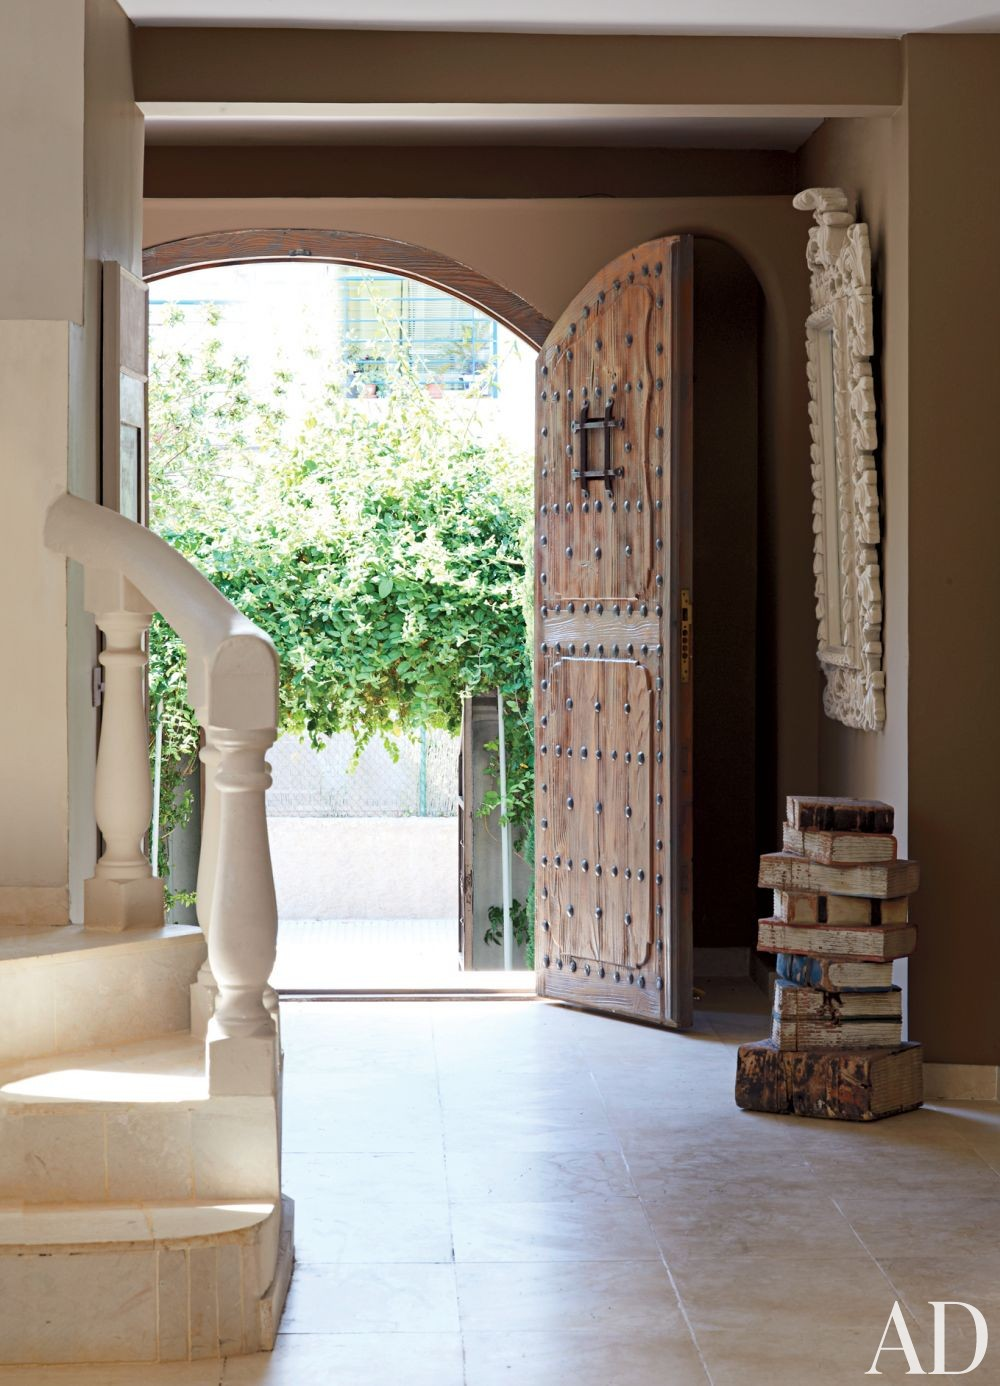 Exotic Entrance Hall and Perla Stefani Architecture in Ibiza